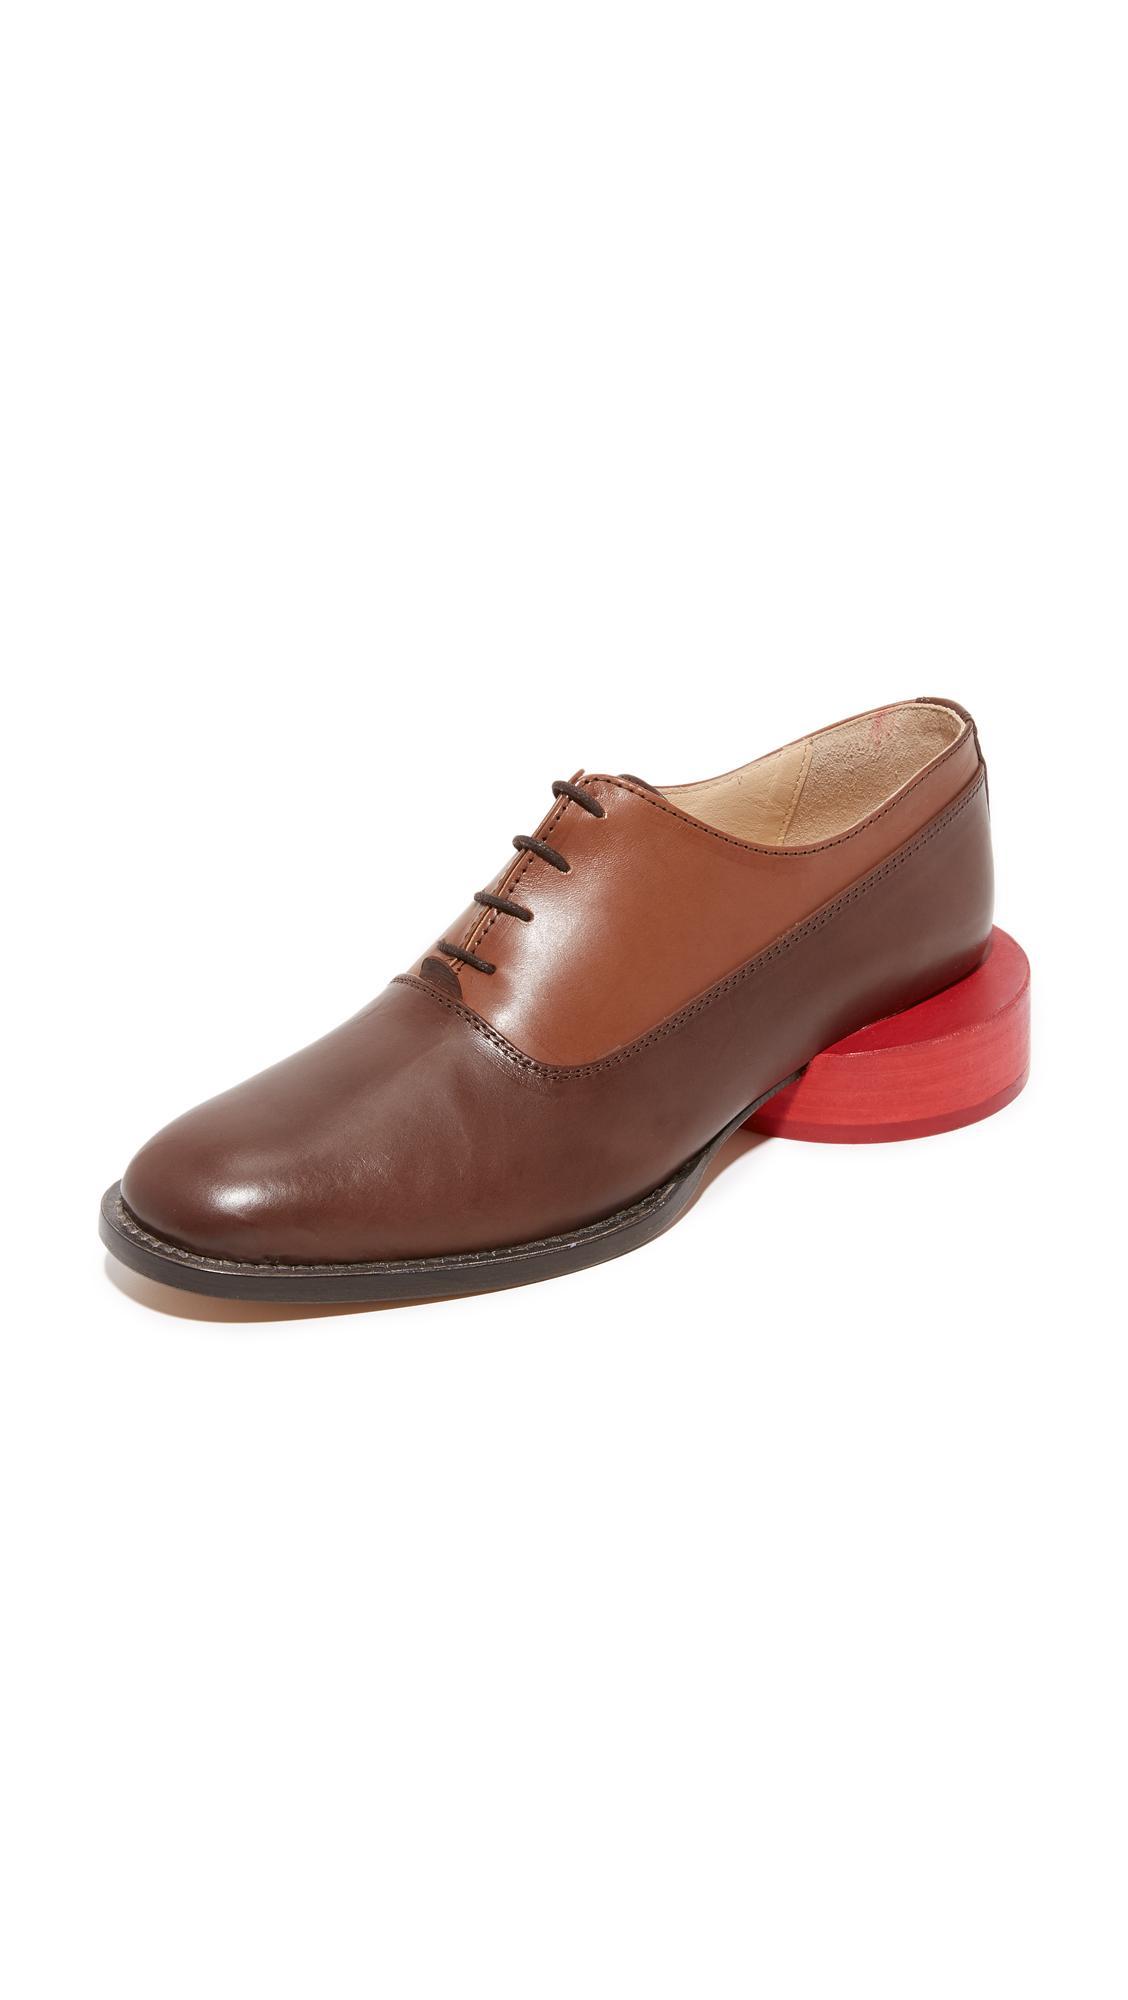 Clown Flats Shoes Women